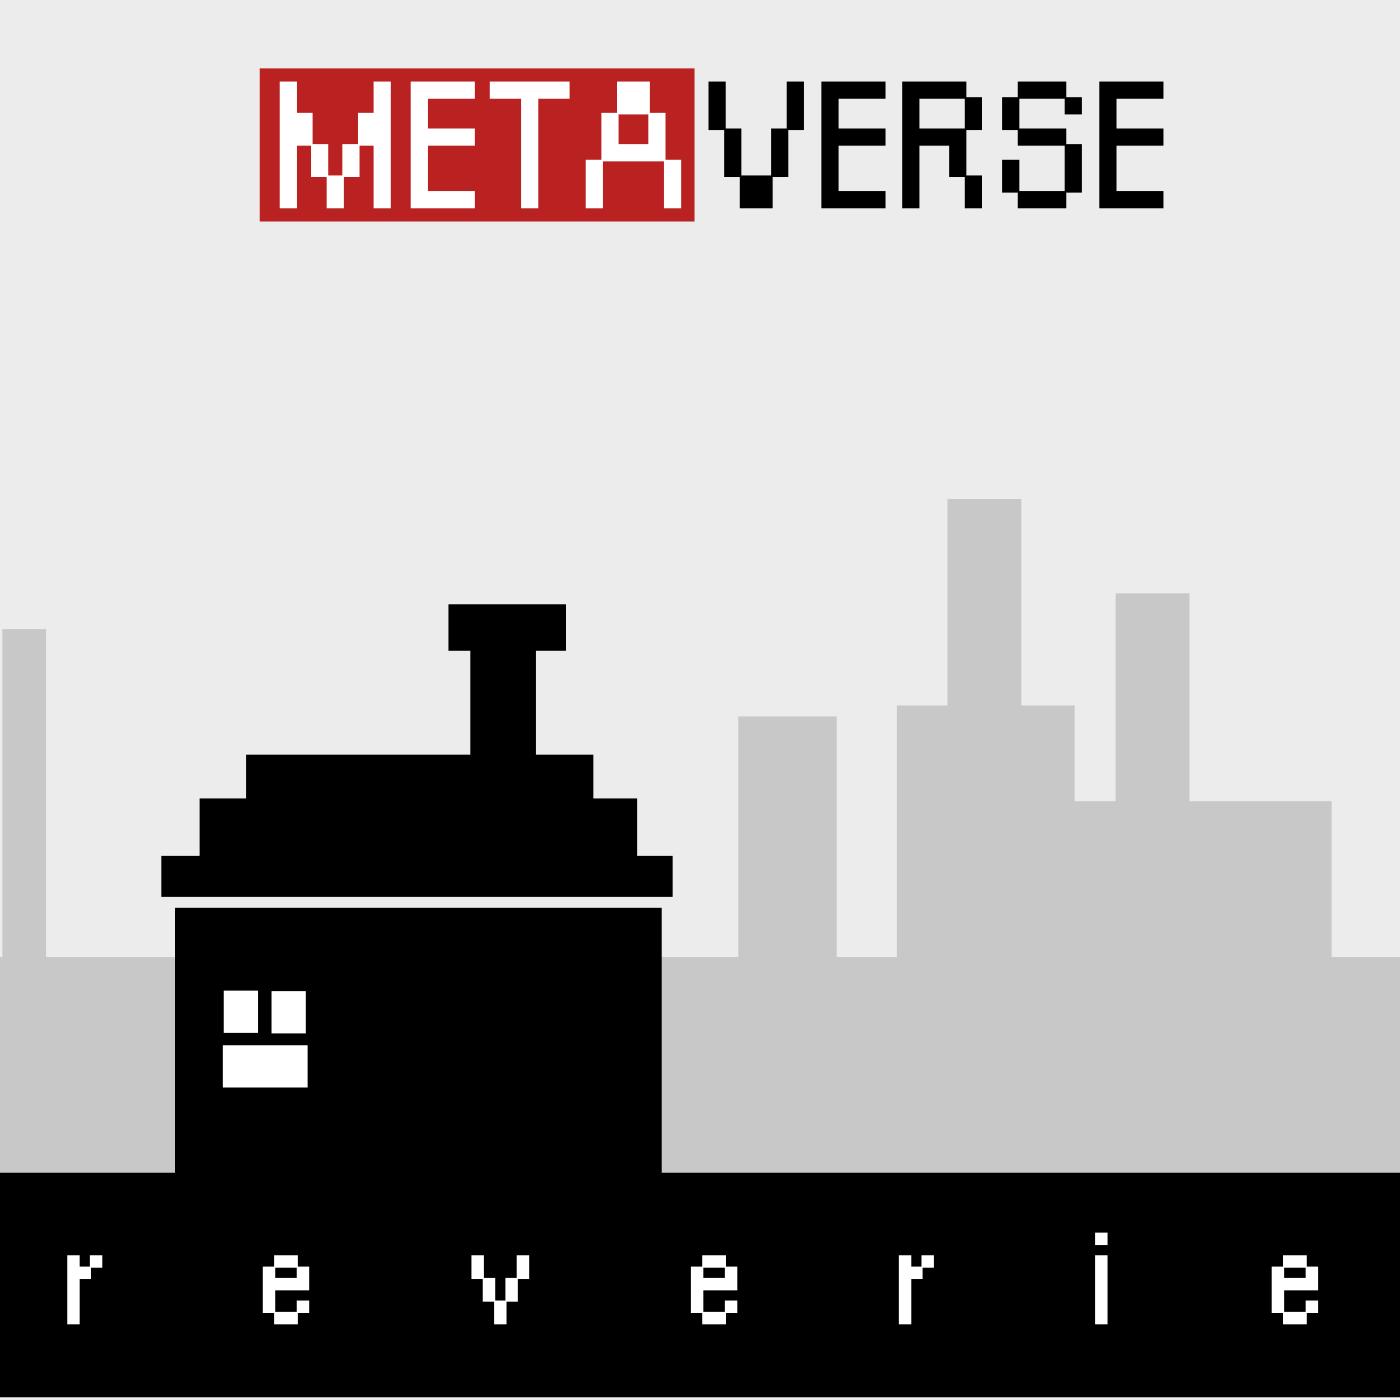 Metaverse Reverie